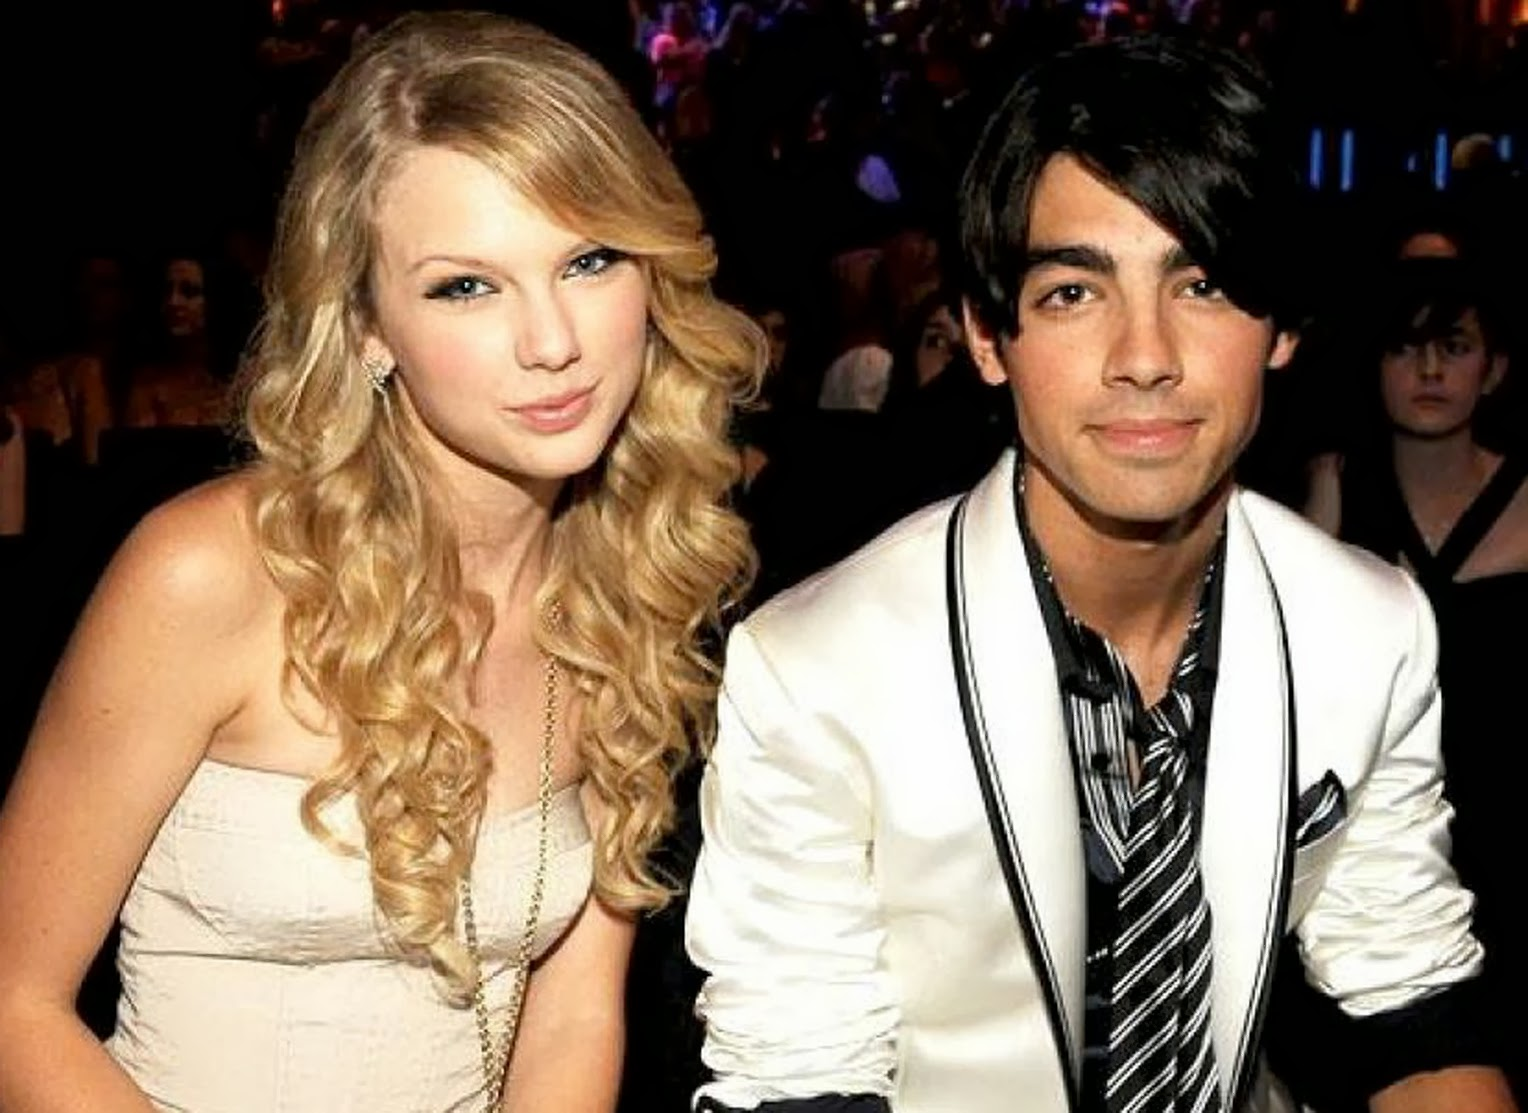 Taylor Swift dan Joe Jonas Brothers: Our heroes forever